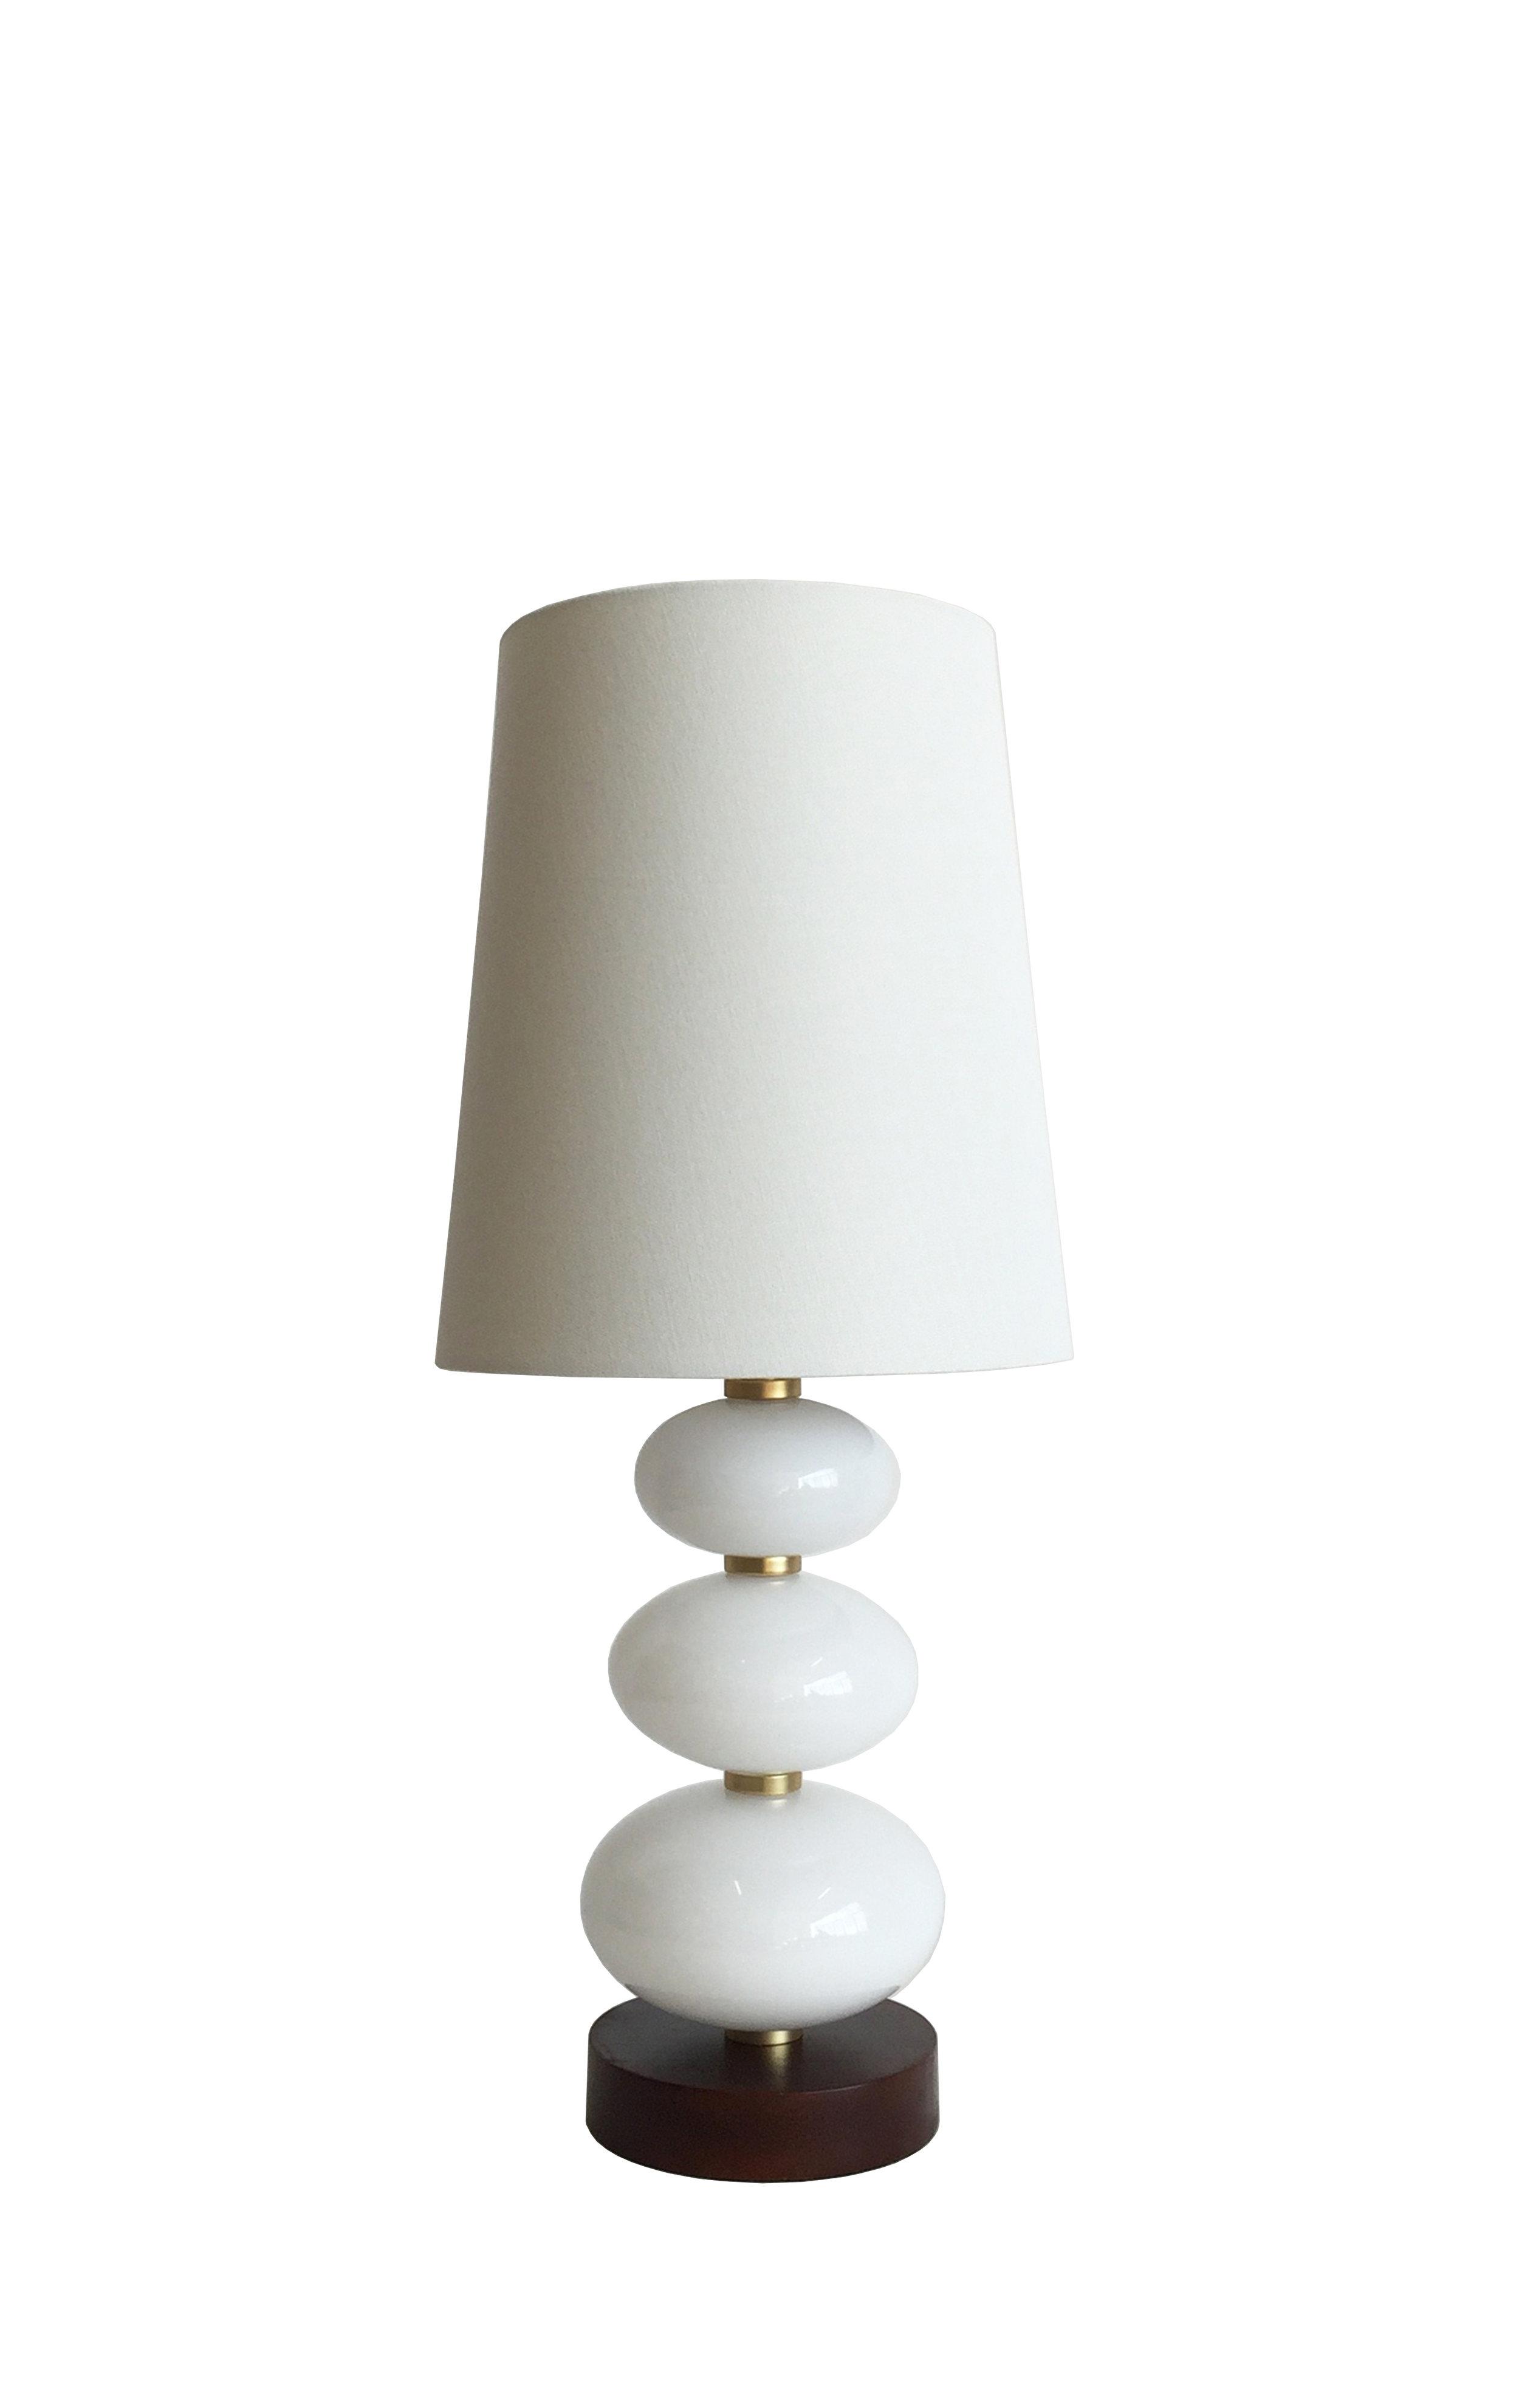 30003664_02_Patty-Table-Lamp.jpg